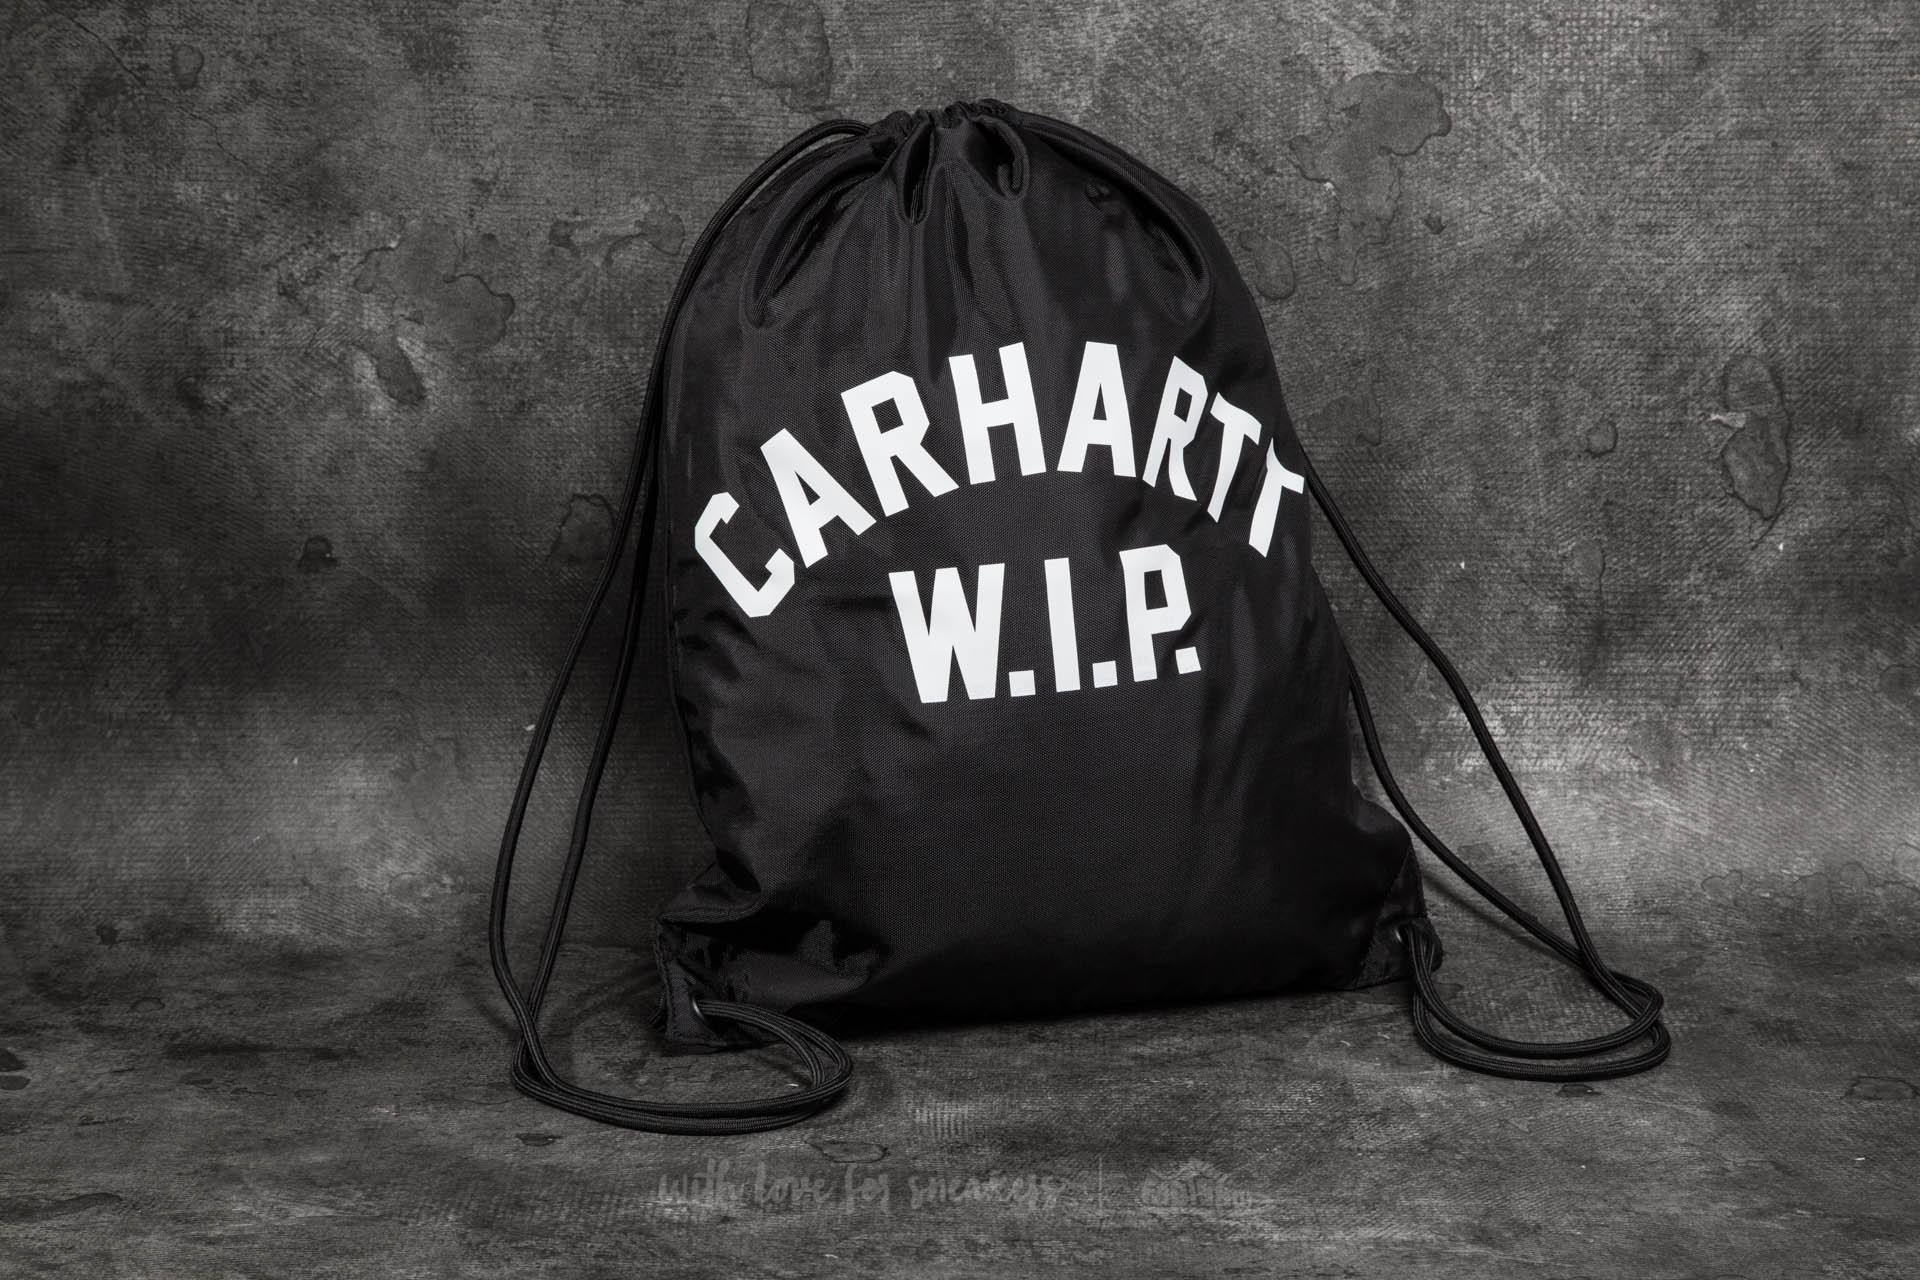 Carhartt WIP USS Script Bag Black/ White - 10968